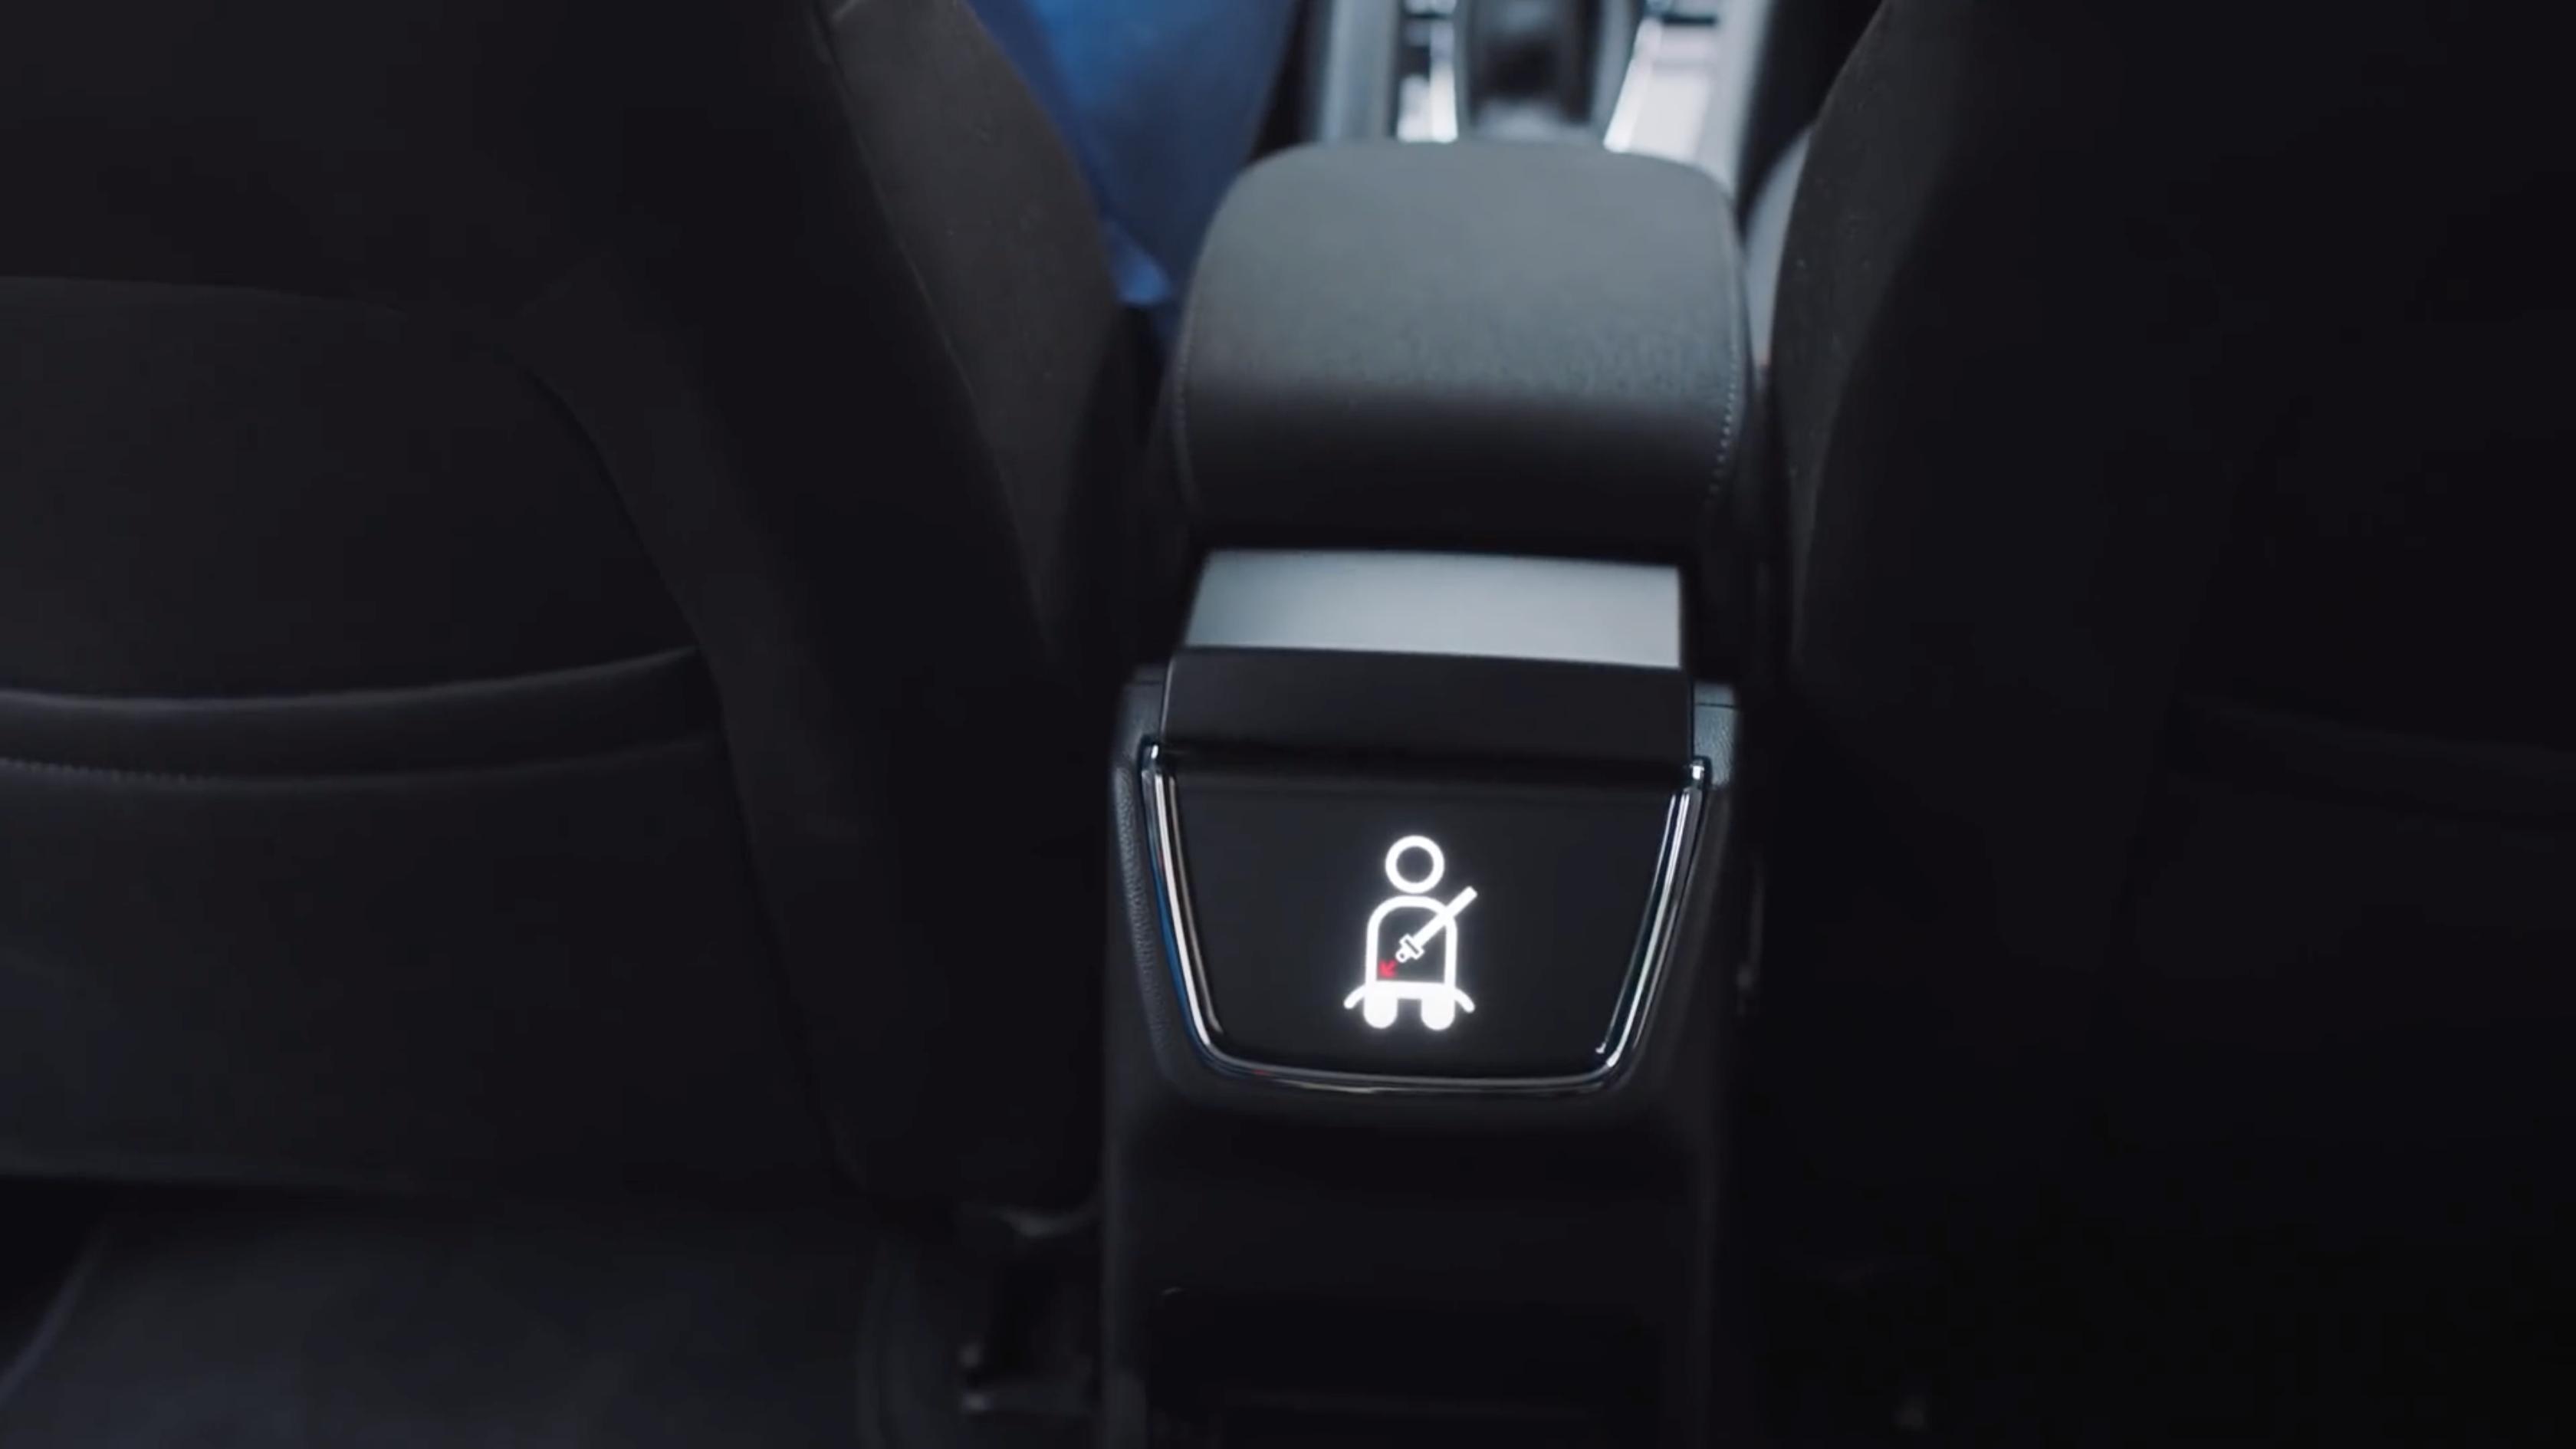 Uber-Safety-Never-Stops-Seatbelt-Sign